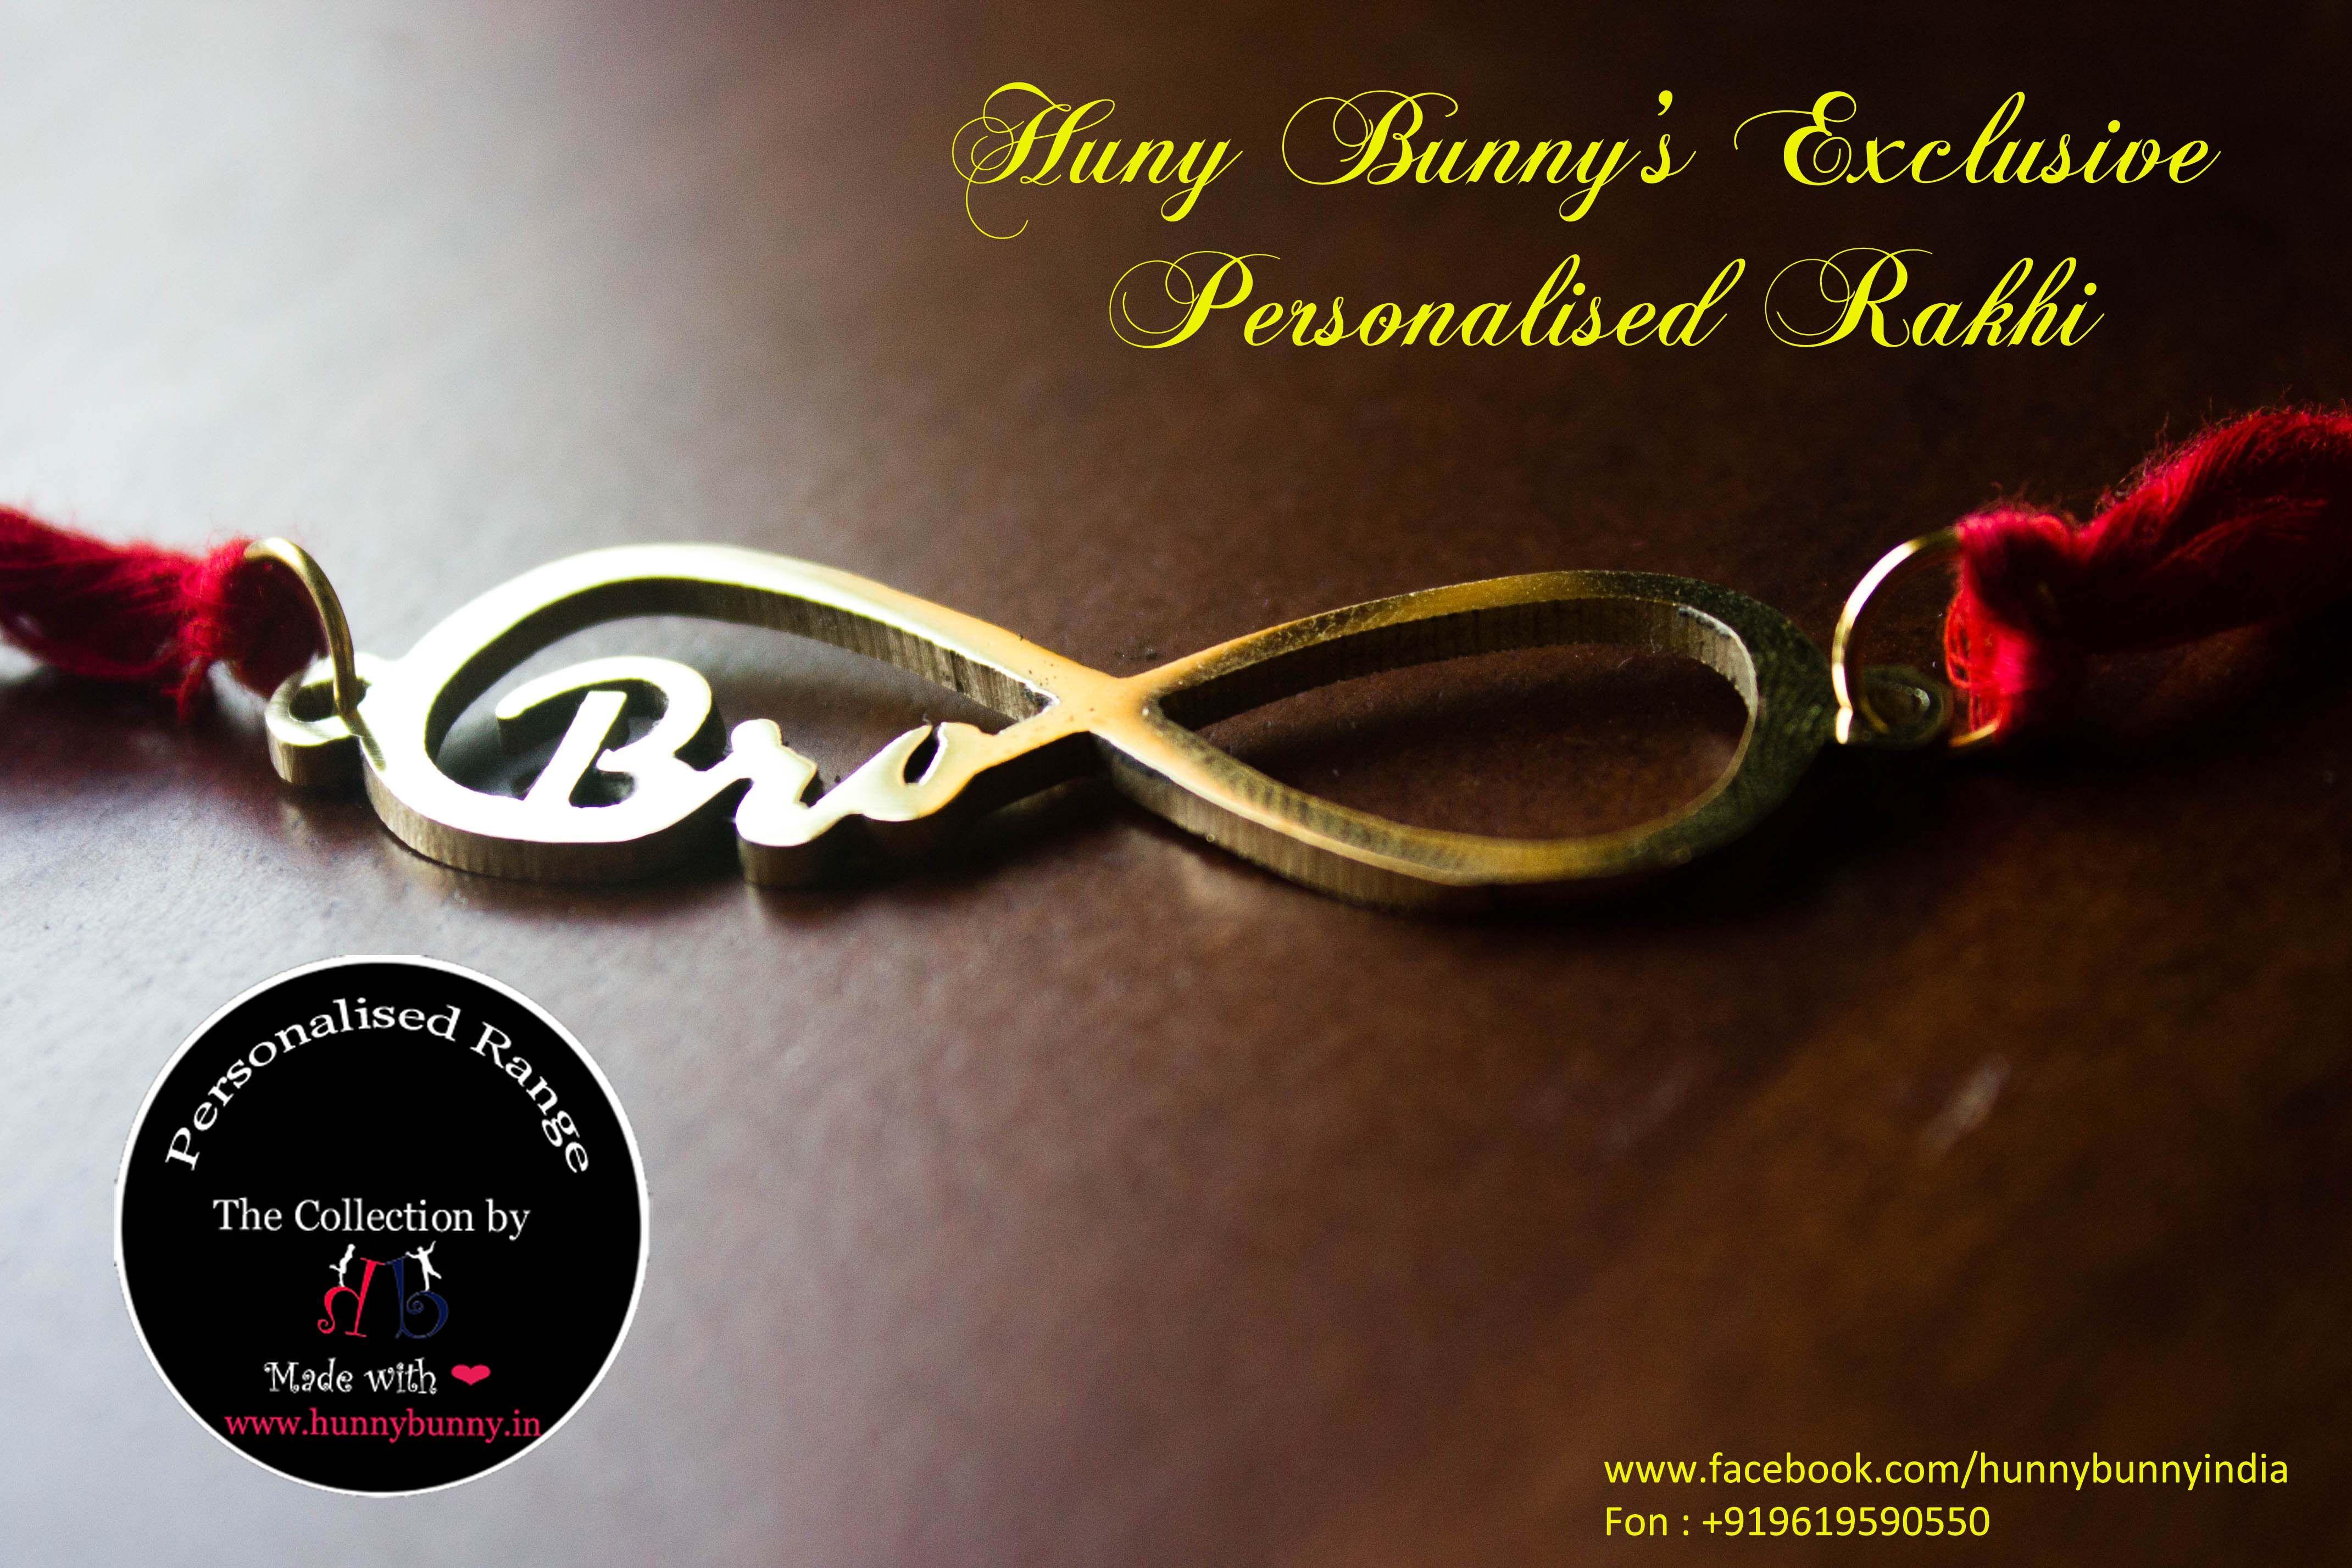 Personalised Name Rakhi Personalised Personalisedbro Love